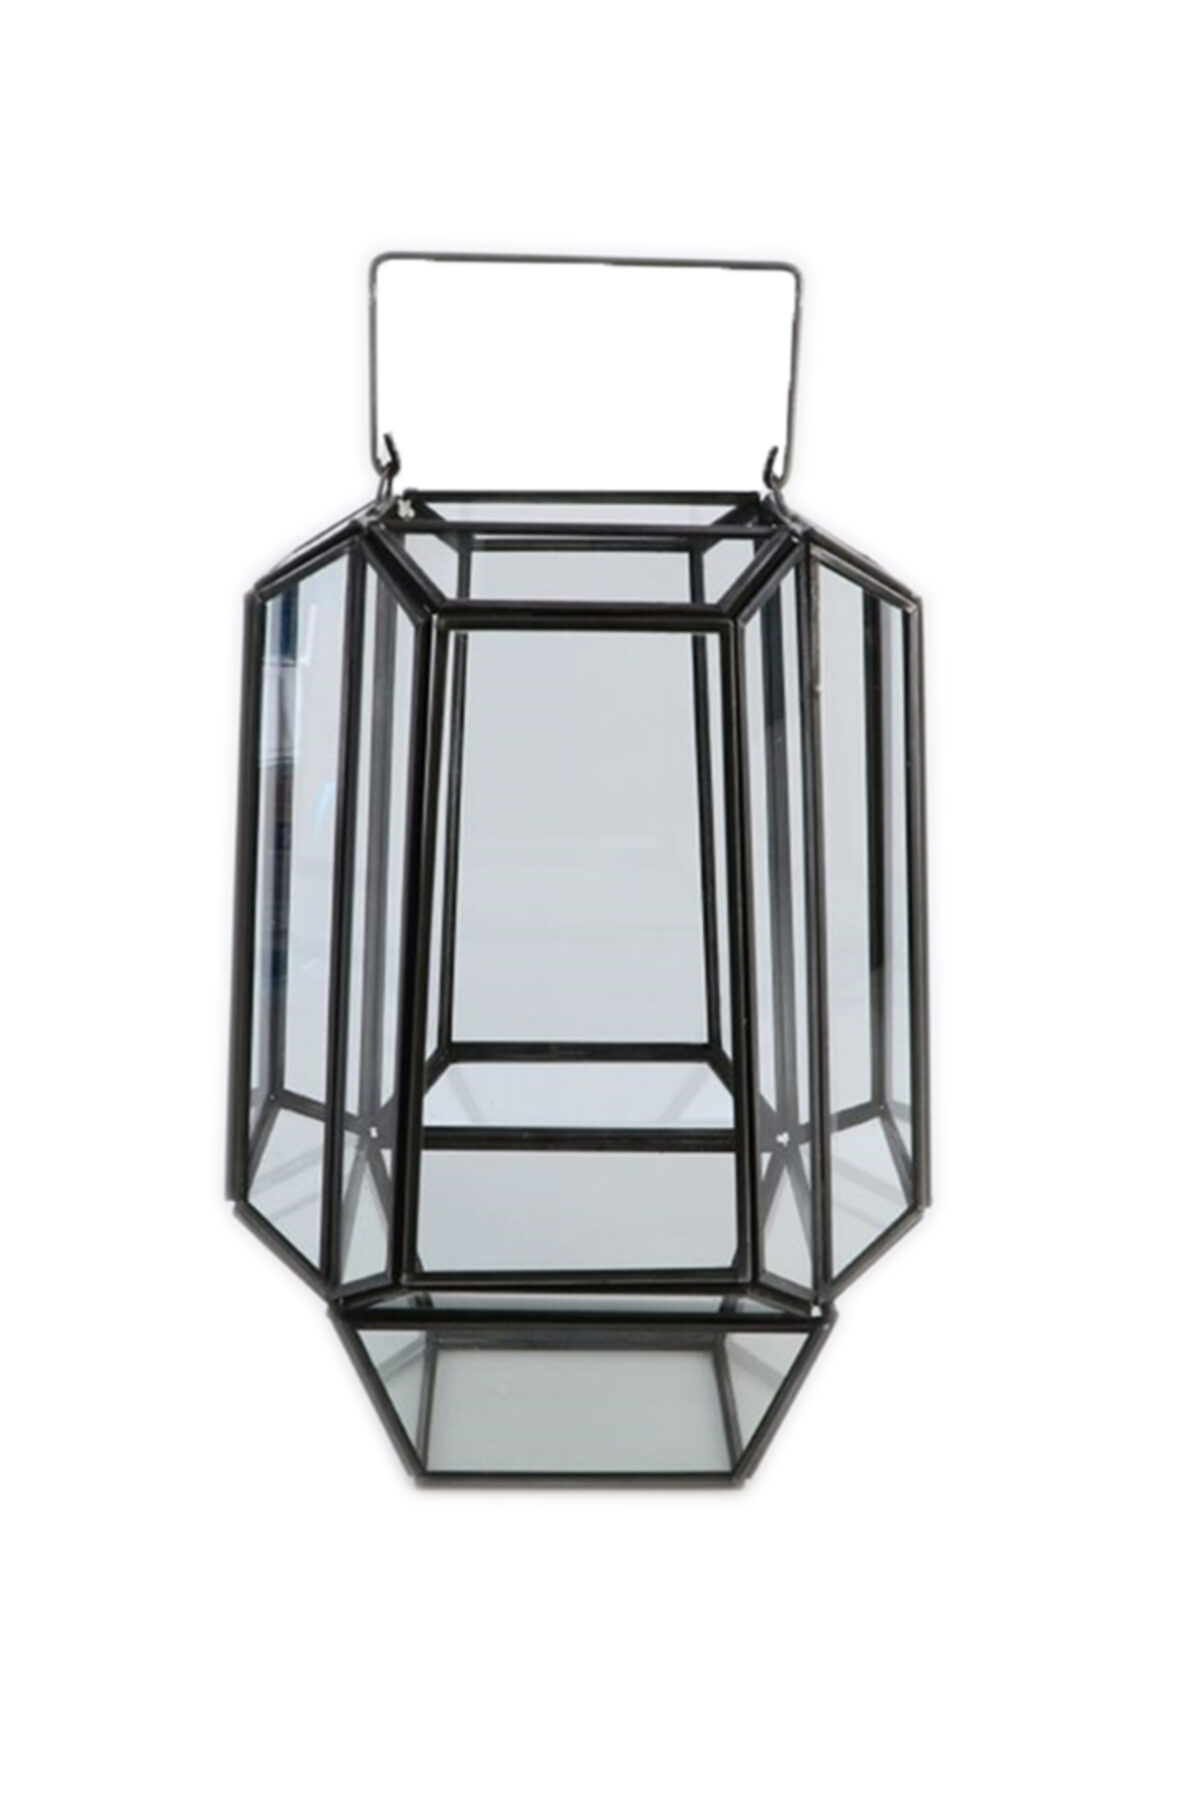 Lanterna geometrica in vetro e zinco d. 19 h. 34 cm